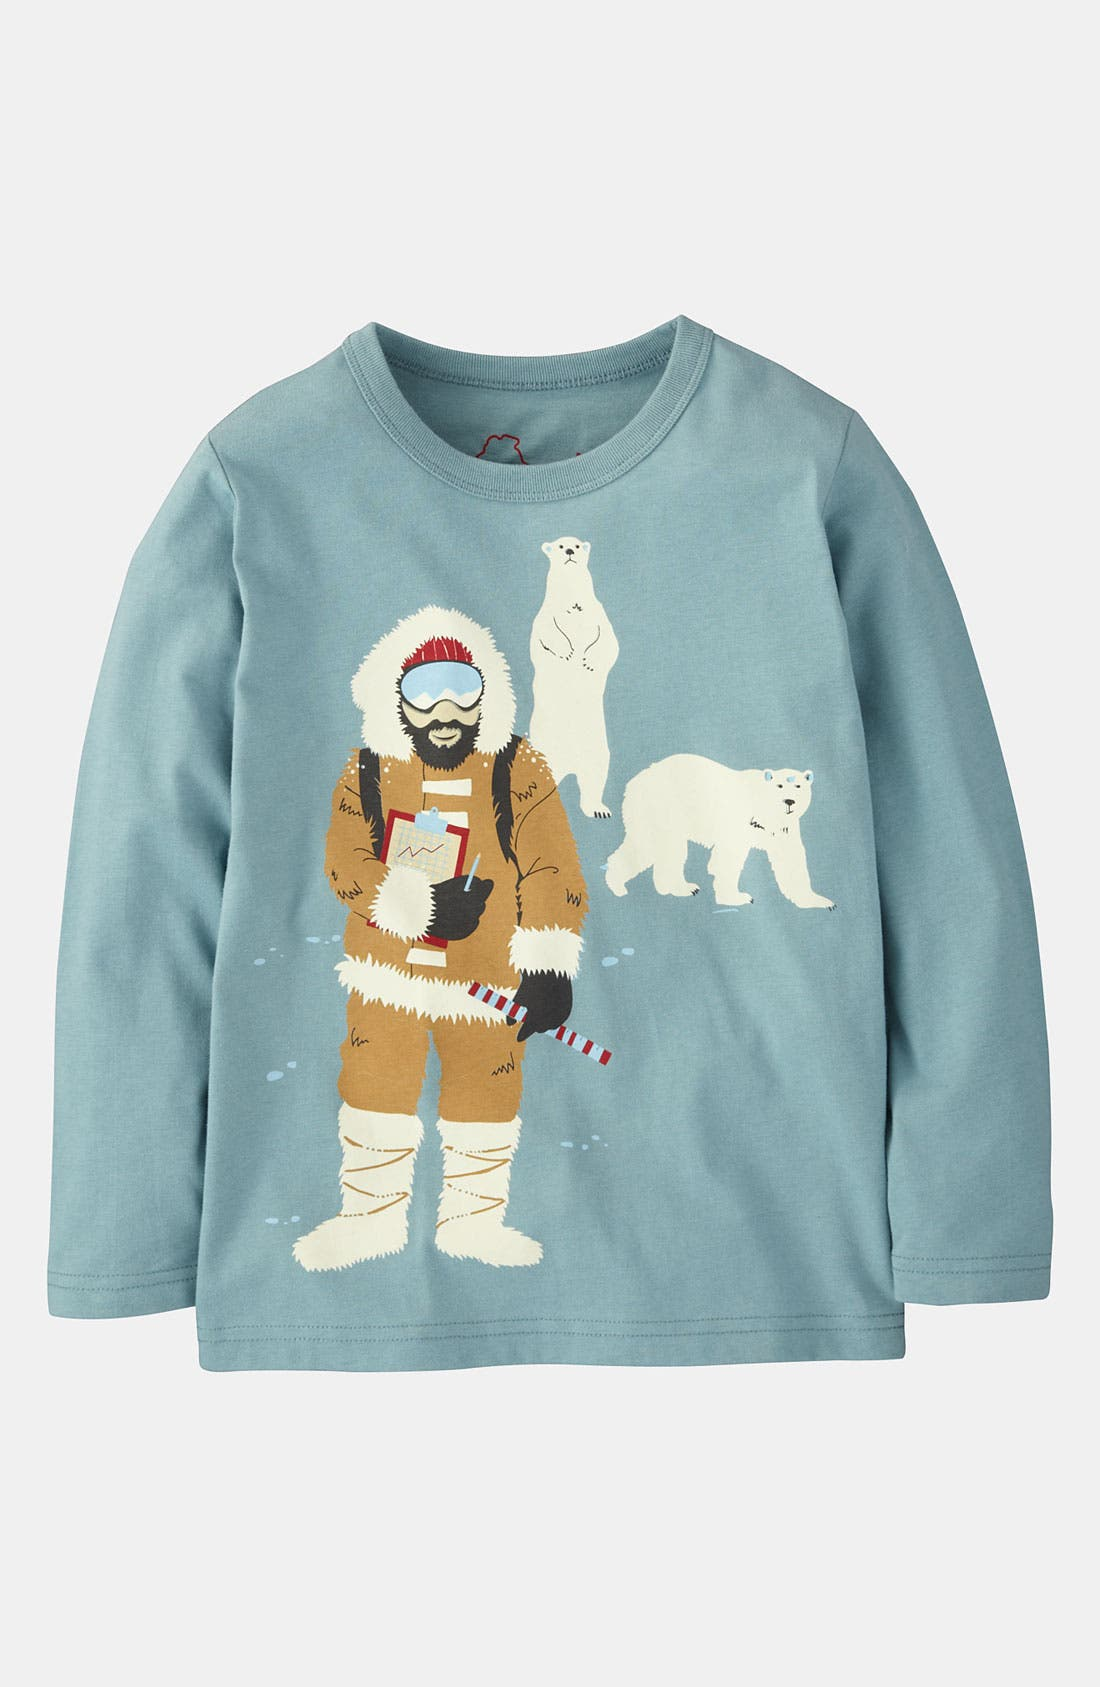 Main Image - Mini Boden 'Exploration' T-Shirt (Toddler)